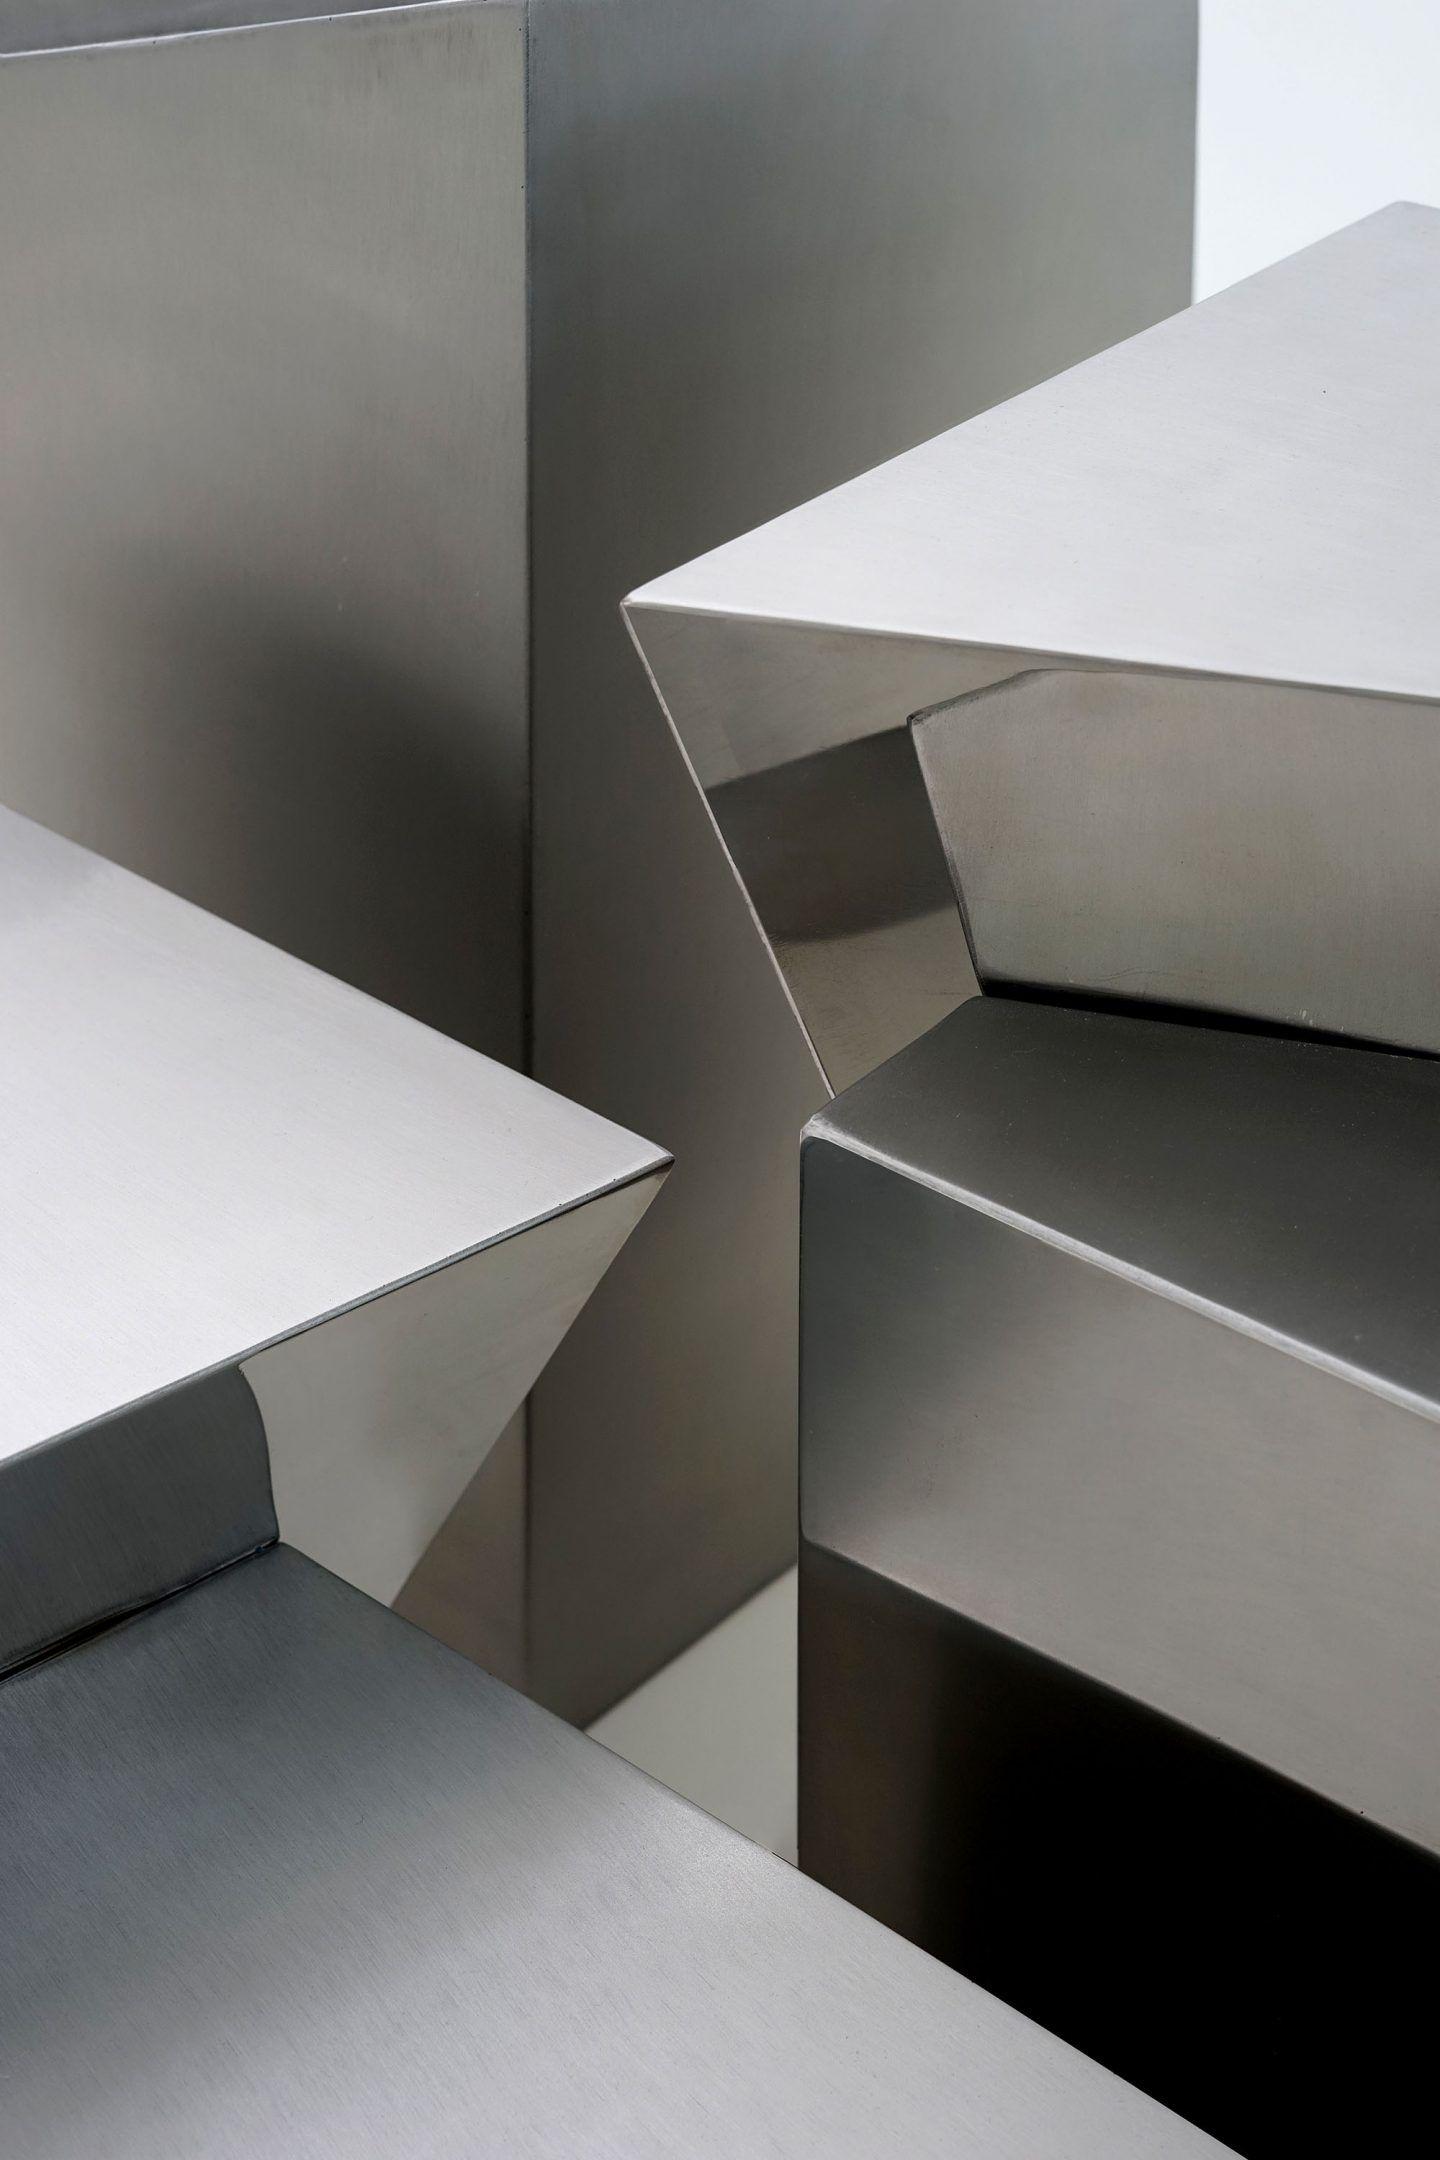 IGNANT-Design-Jeong-Ho-Ko-Hyongho-Park-Slice-Series-10